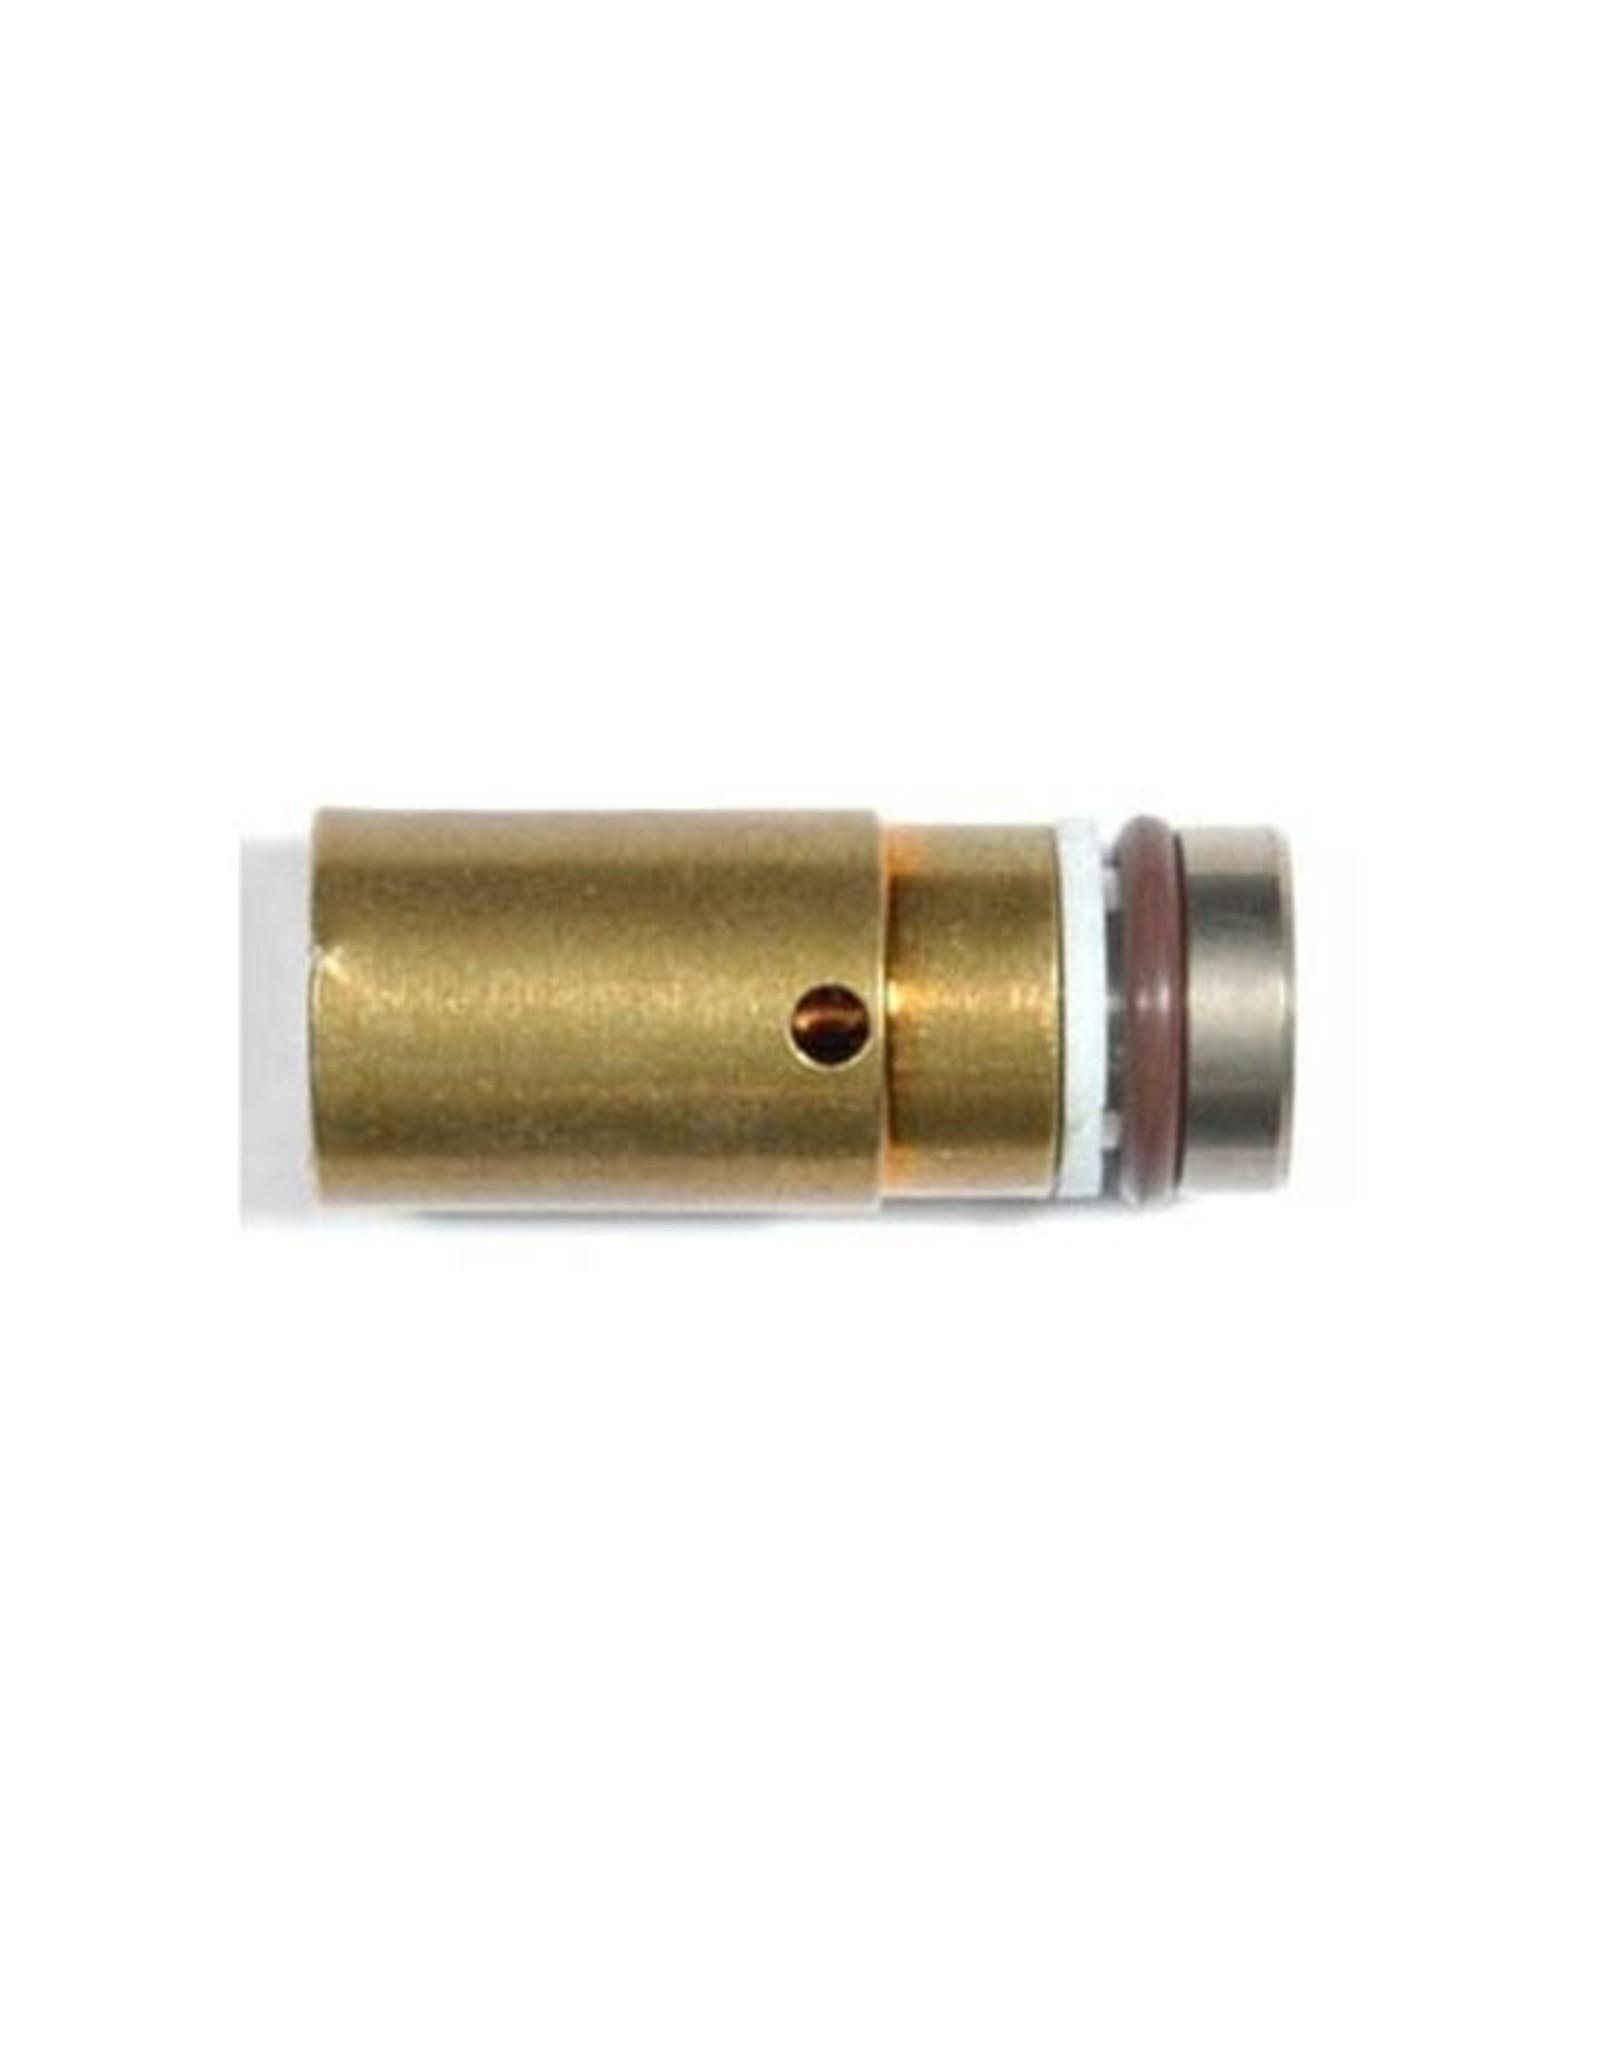 Graco 235009 ST Transducer